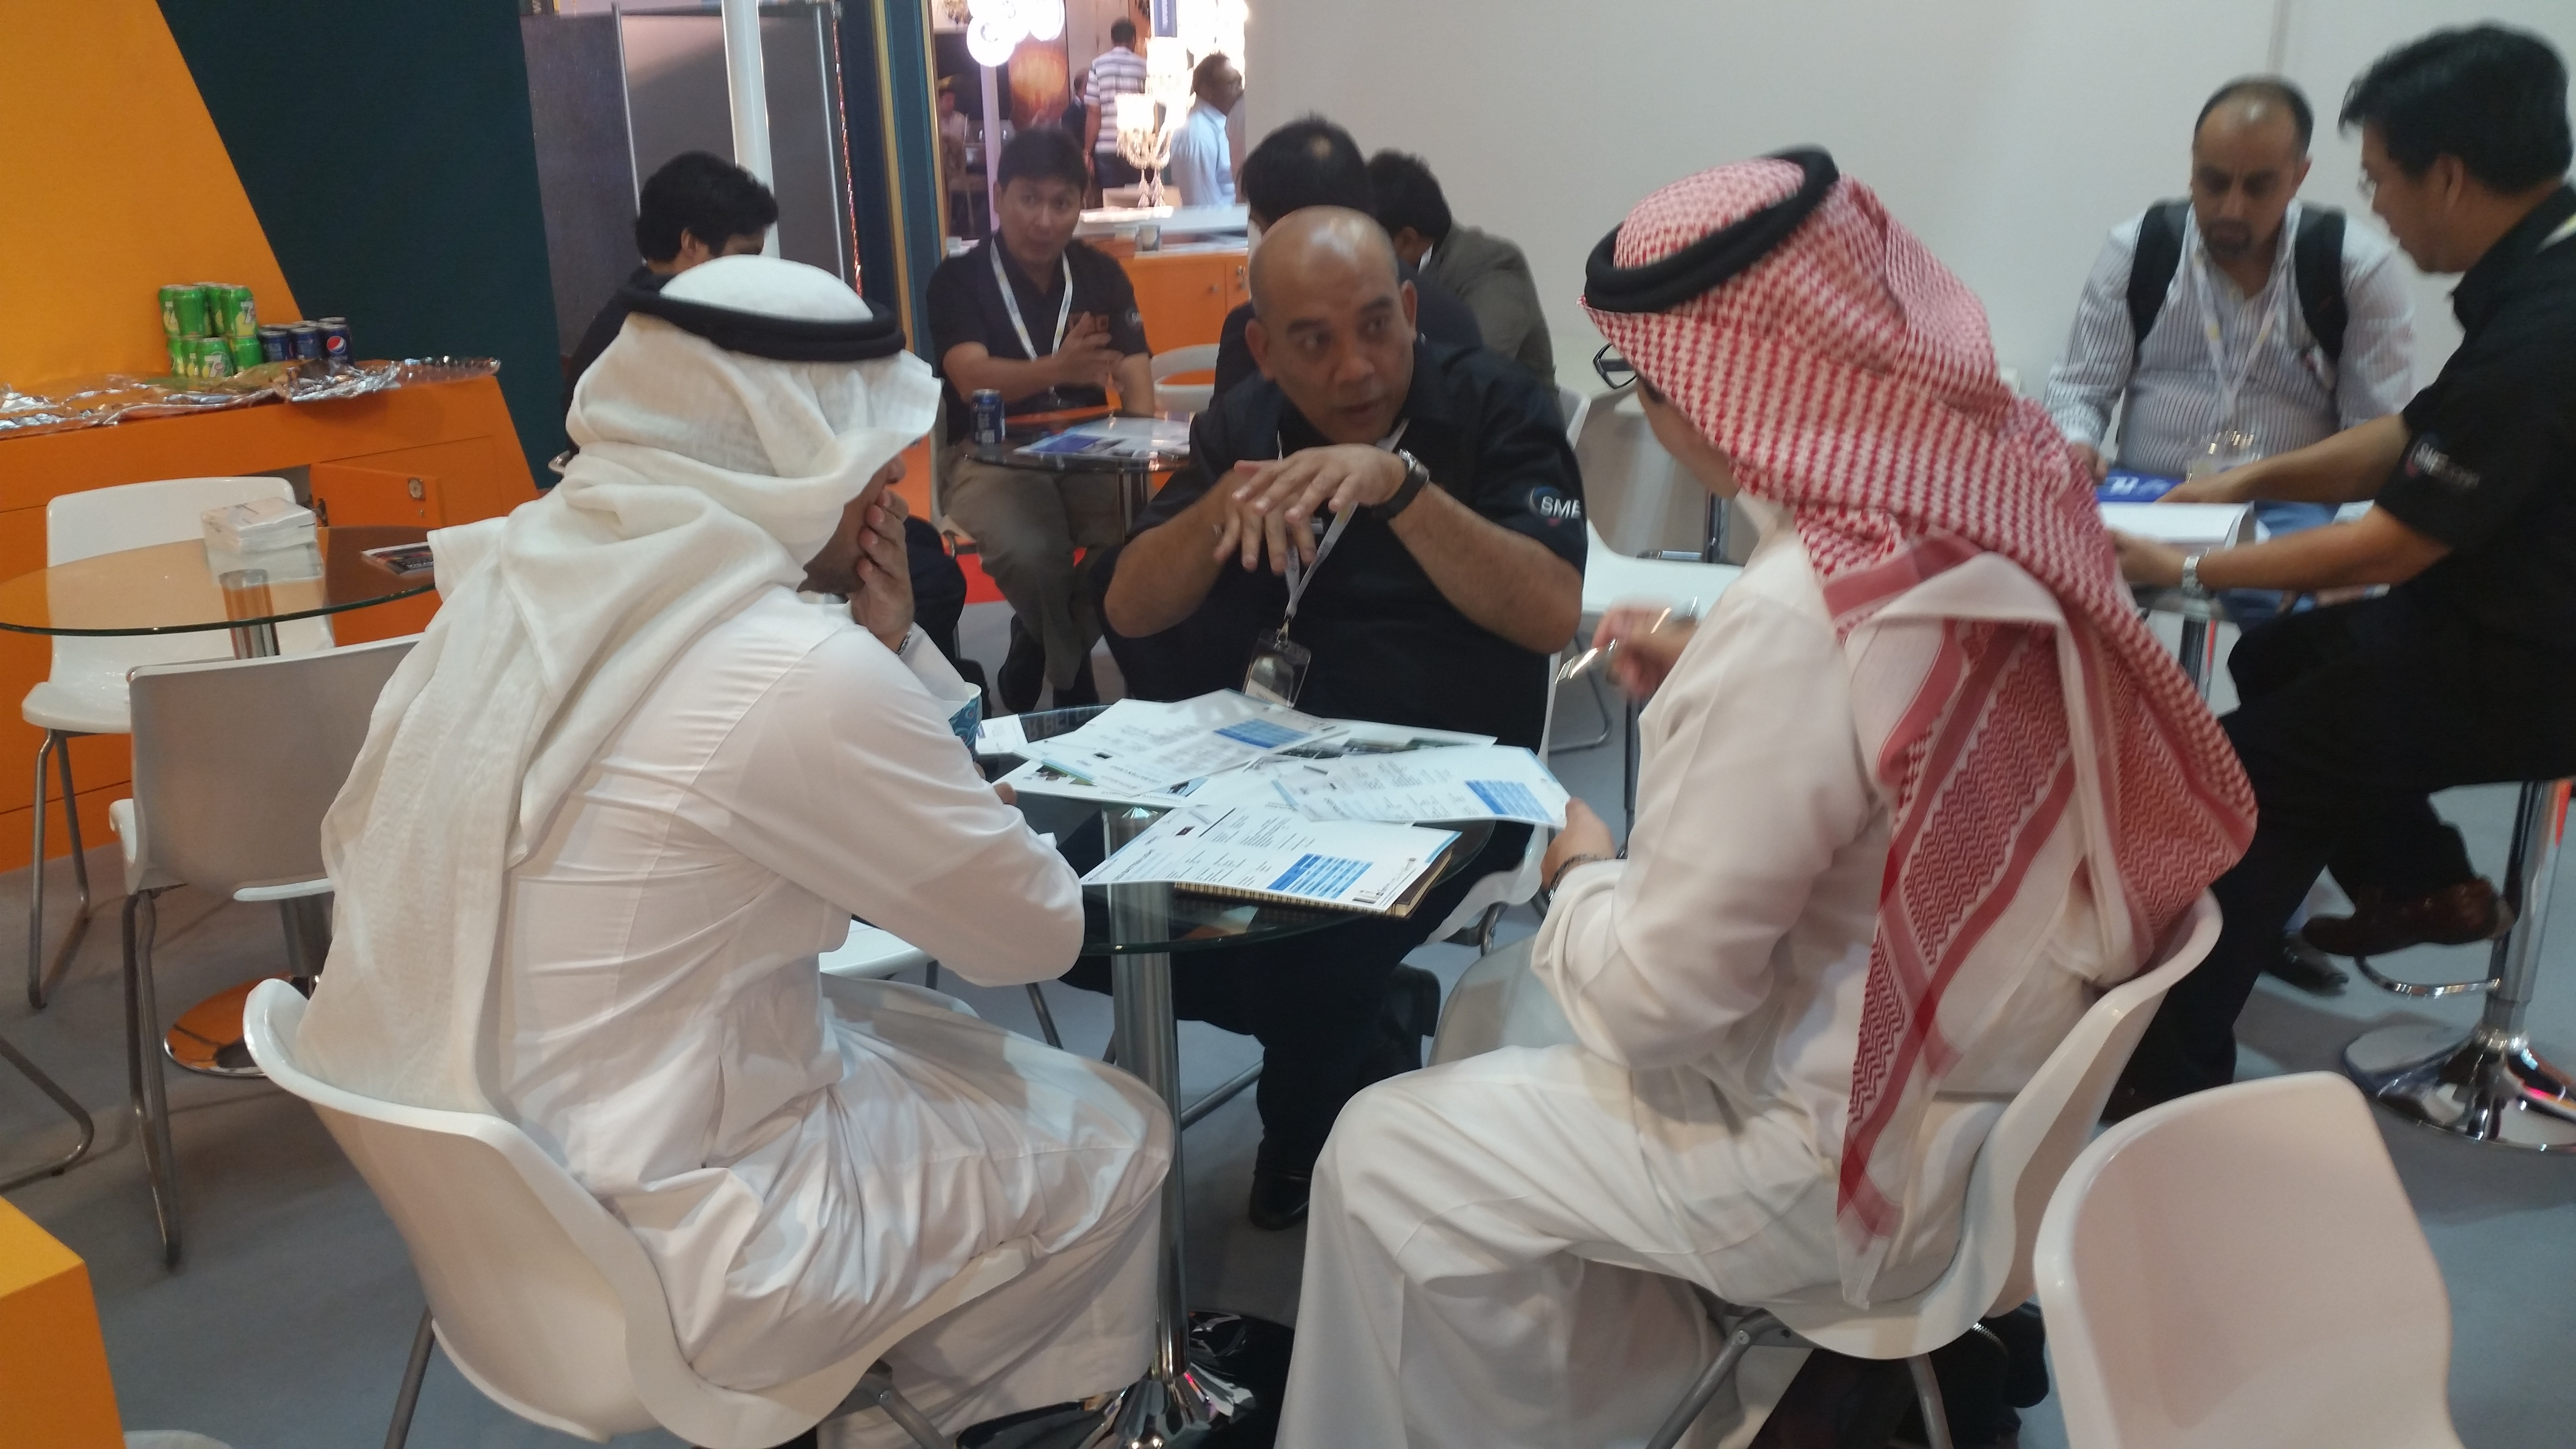 Malaysian company Business Matching in Dubai